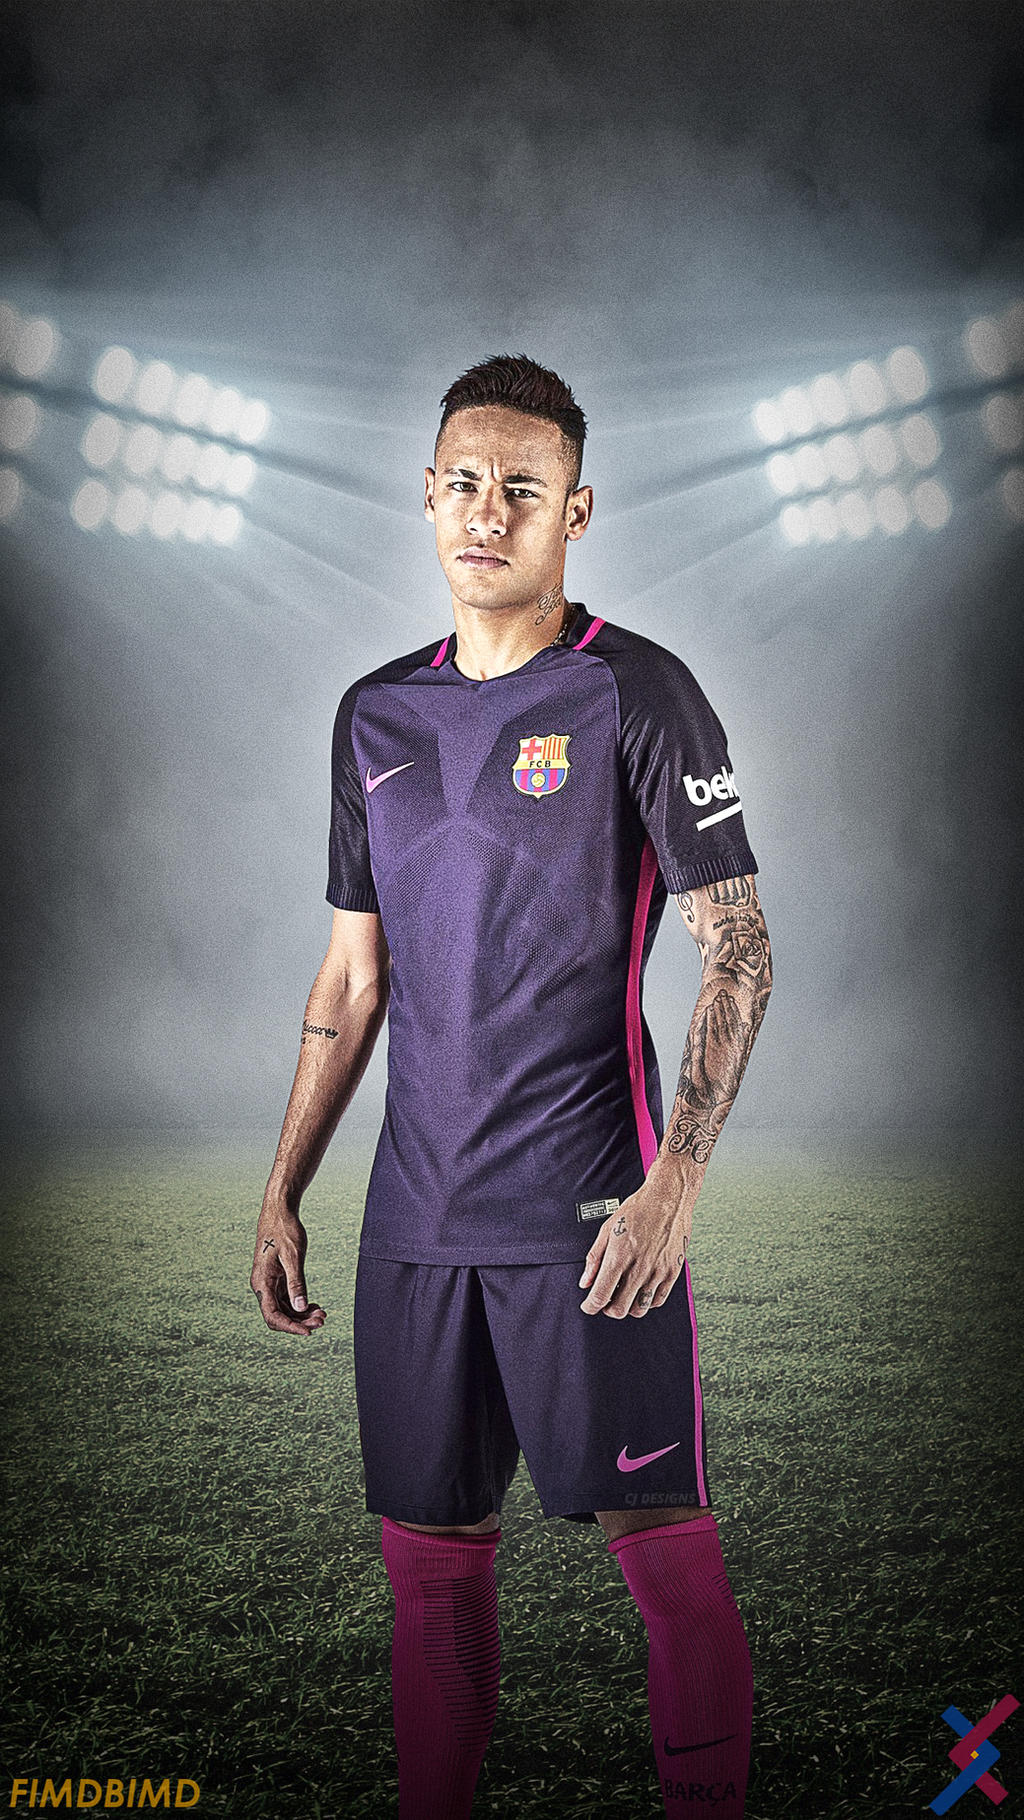 Neymar Jr Wallpaper 2017